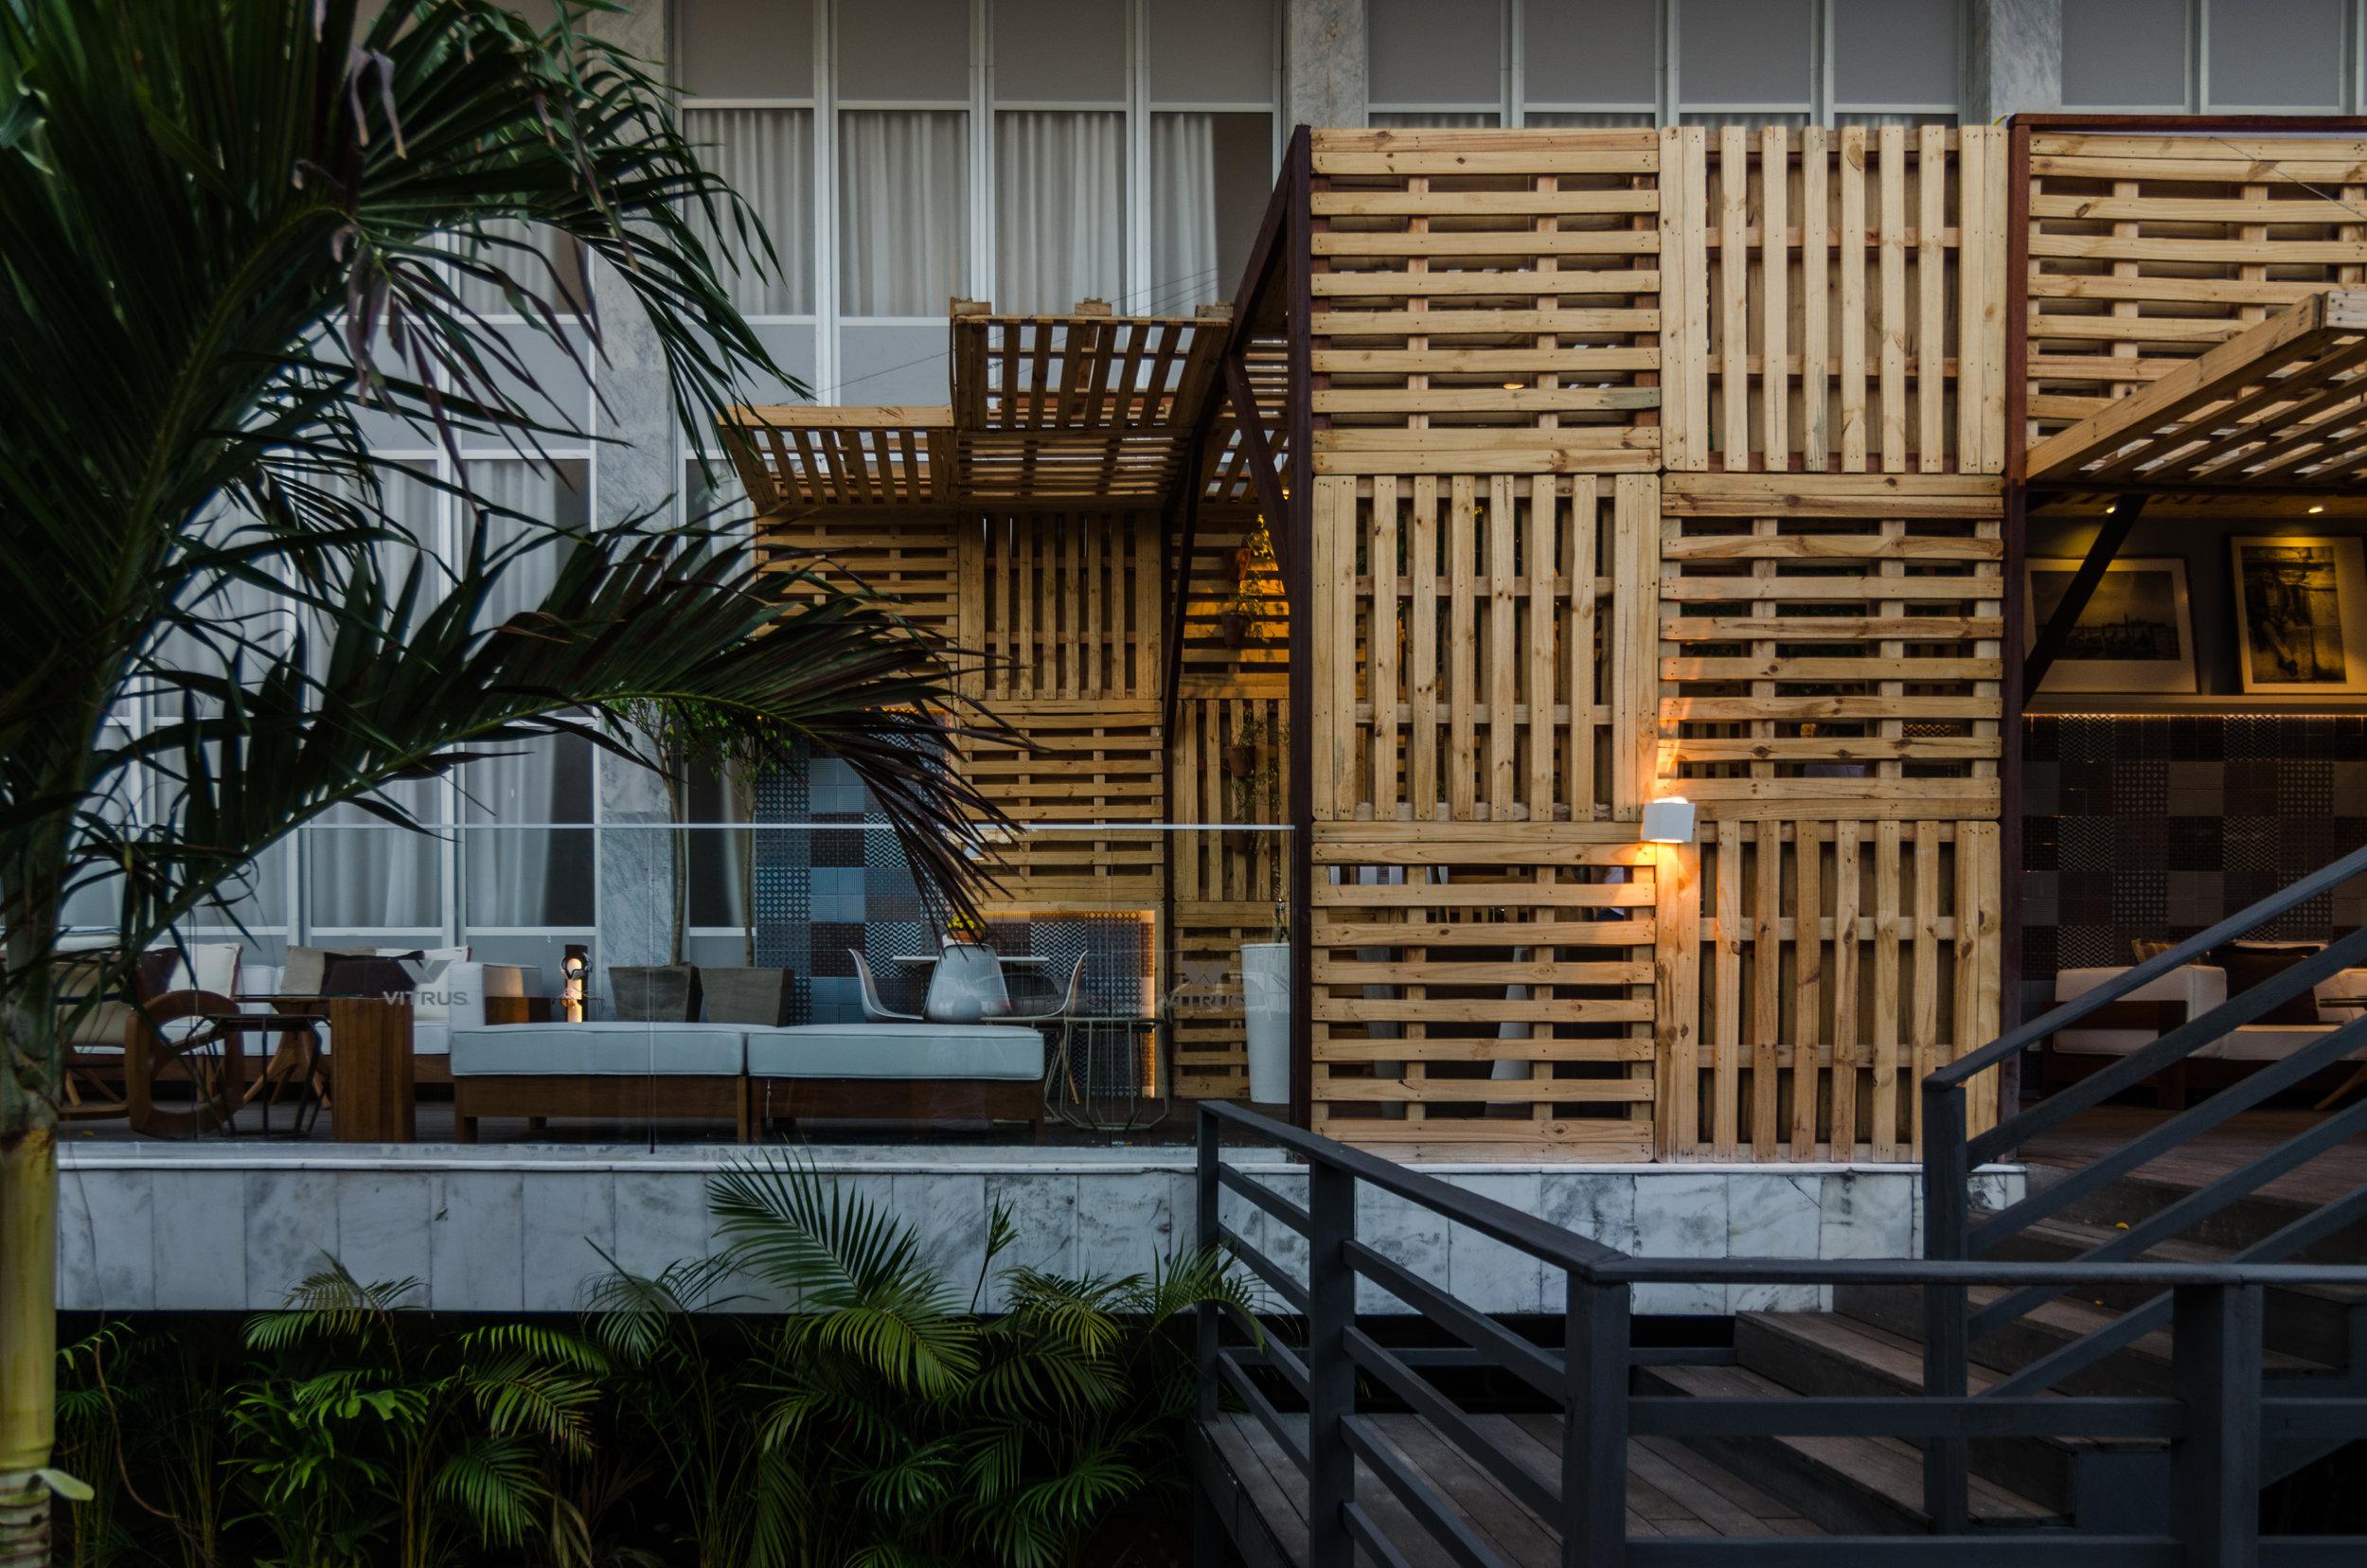 projeto-arquitetonico-cuoredipannacc-duo-arquitetura-02.jpg